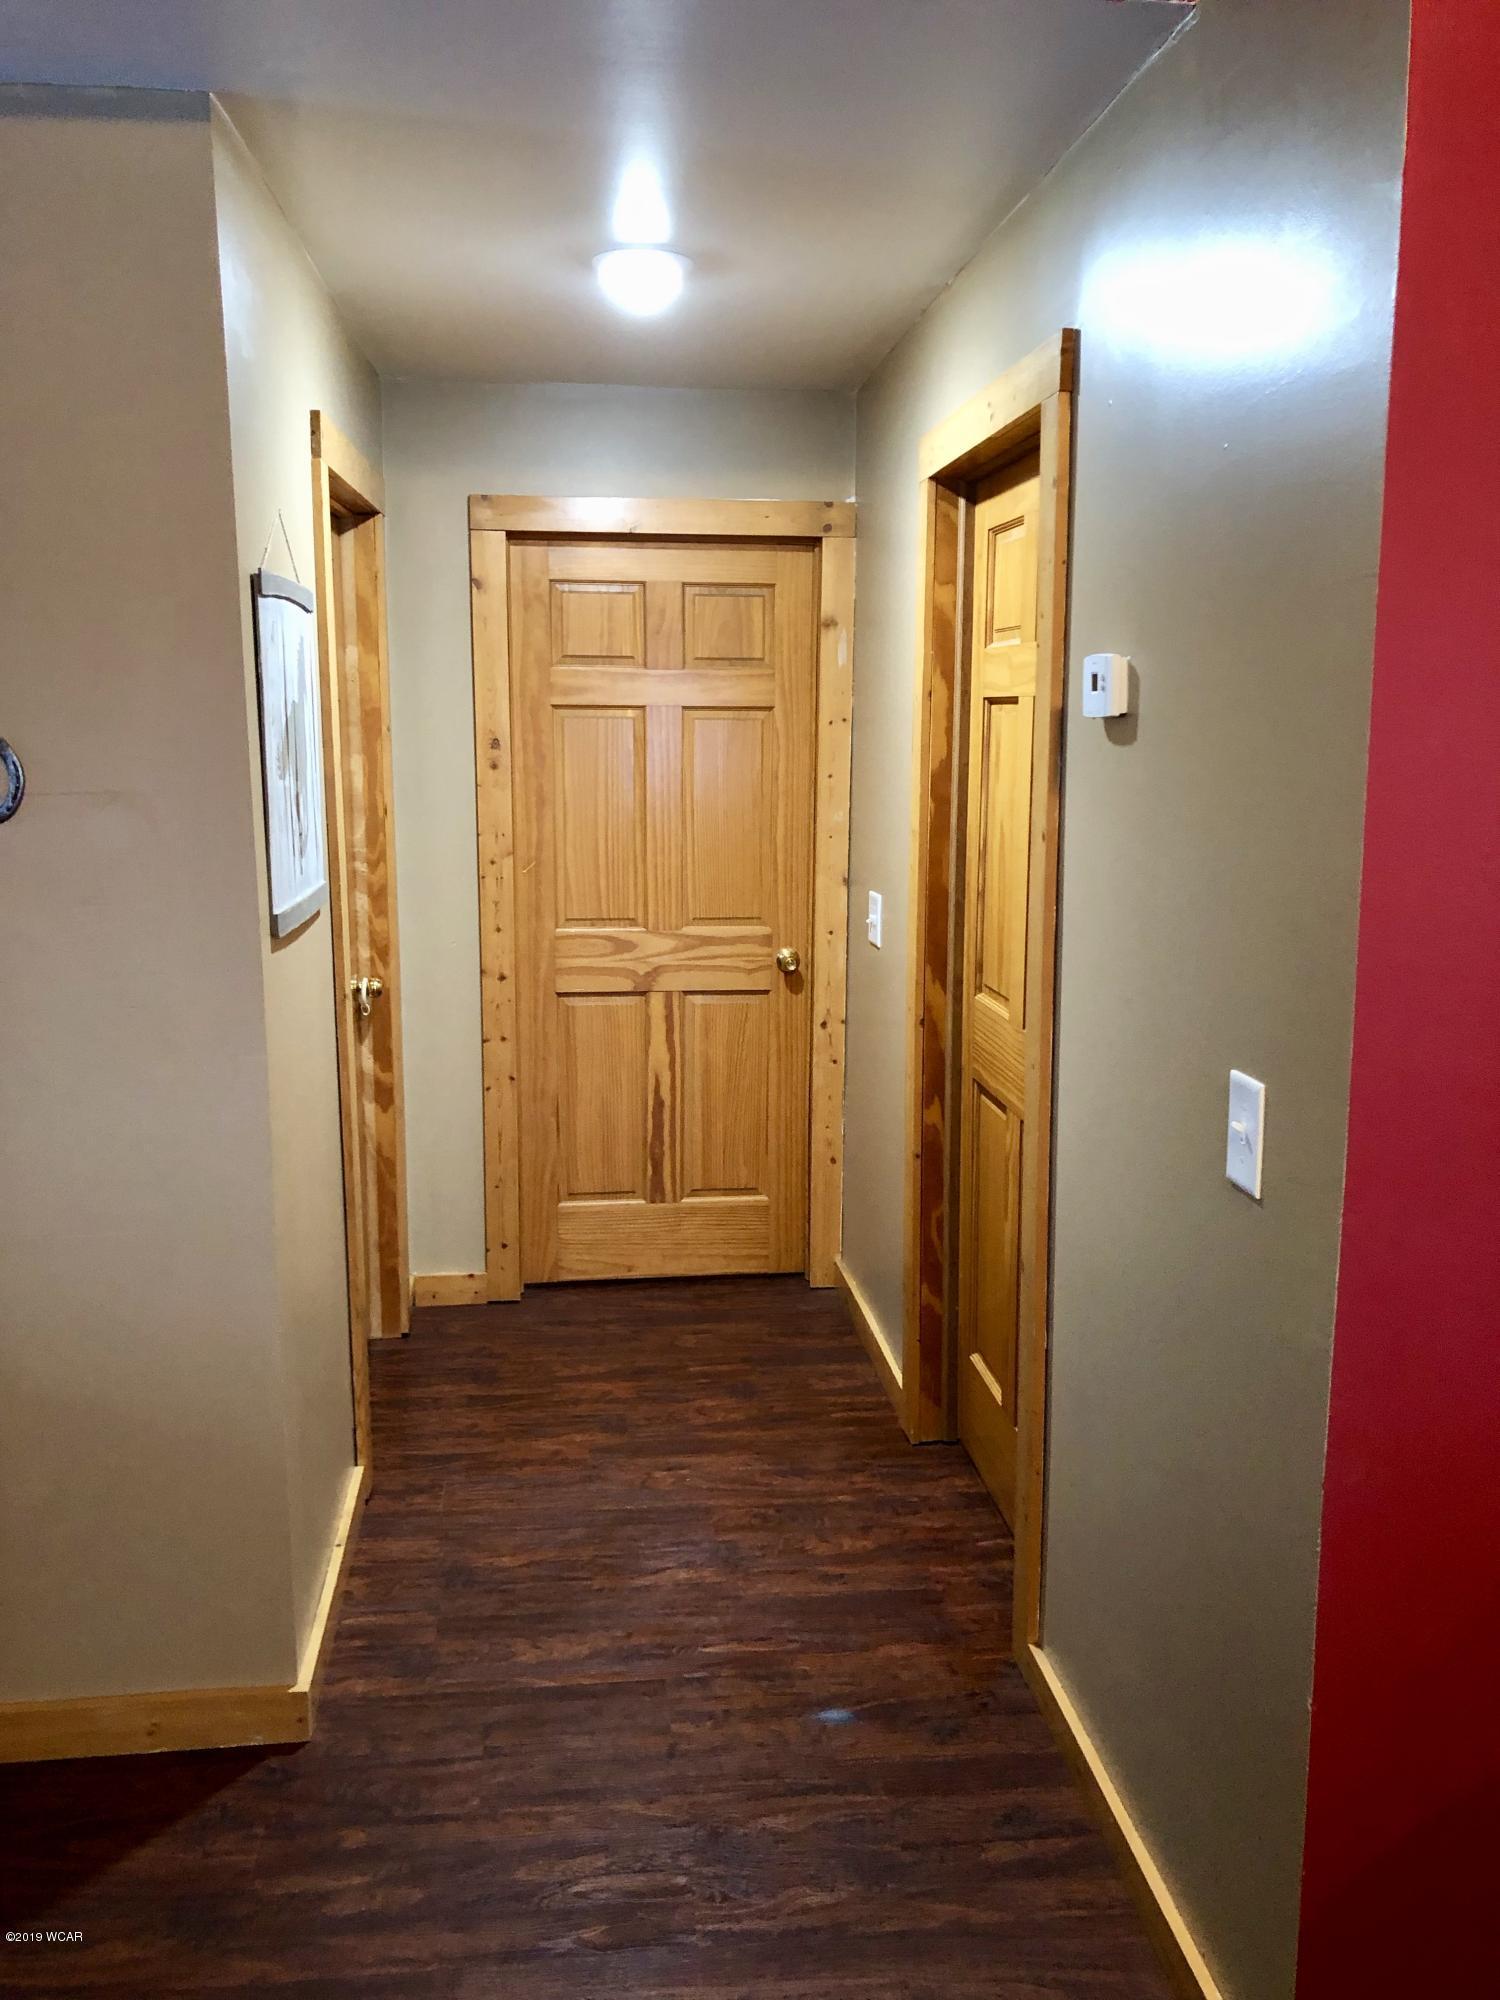 48237 270th Street,Brooten,2 Bedrooms Bedrooms,1 BathroomBathrooms,Single Family,270th Street,6033452